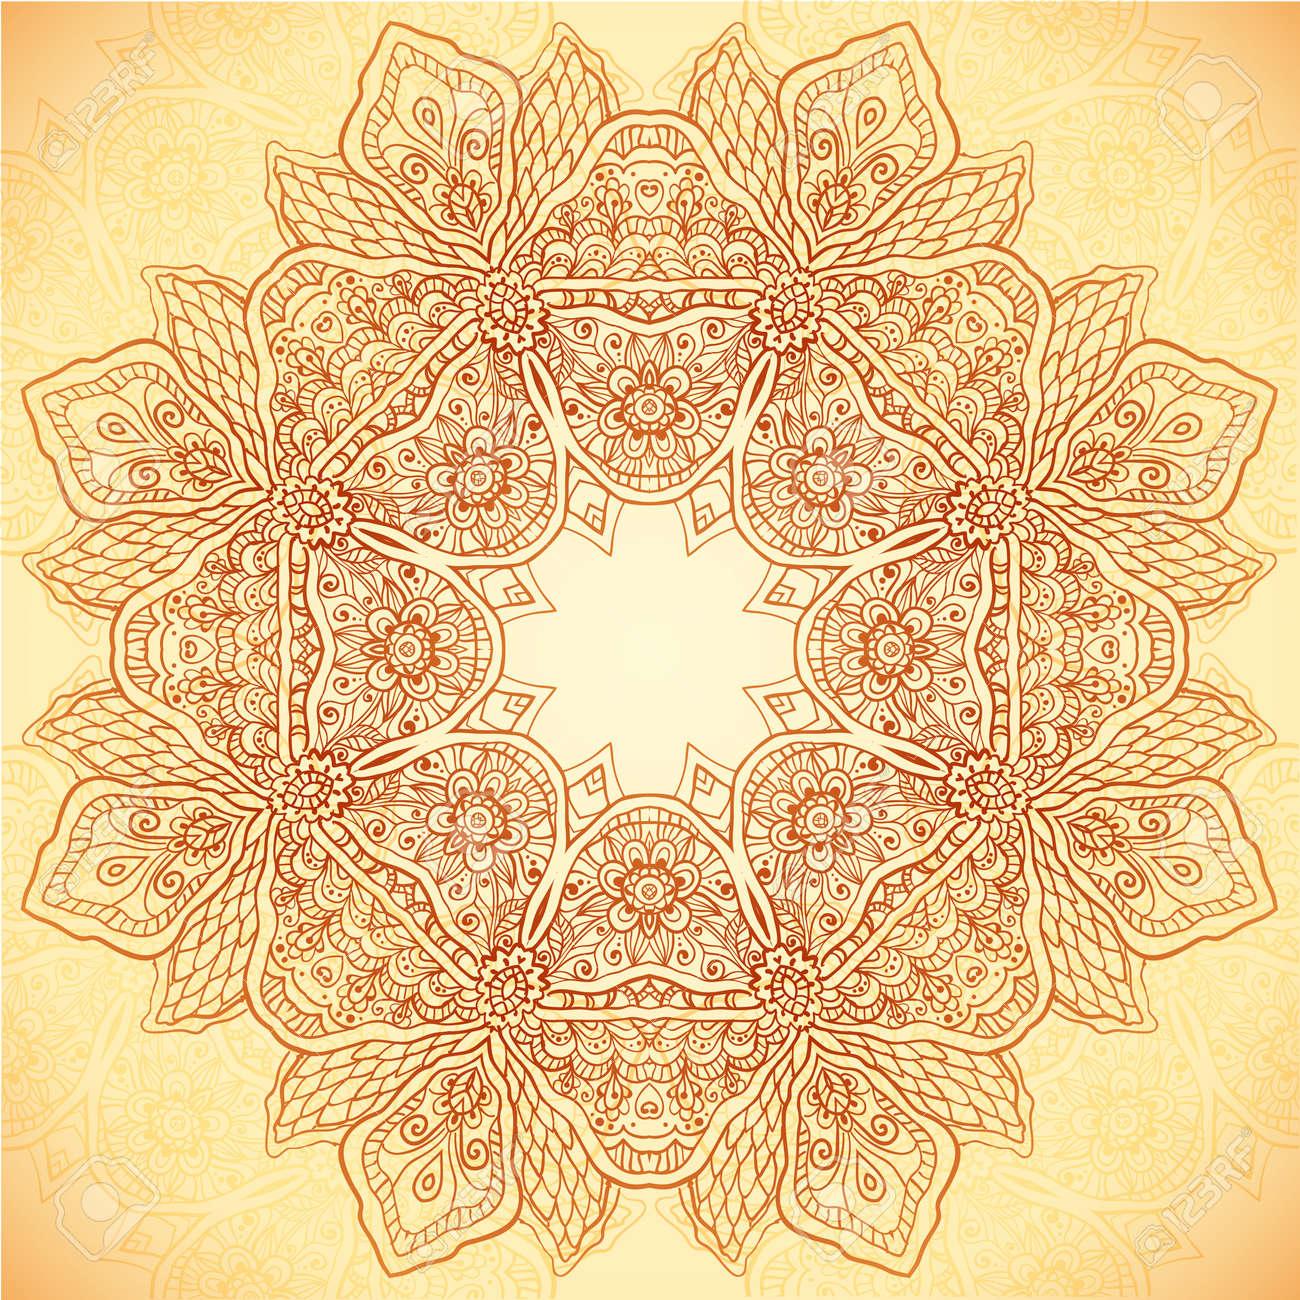 Ornate vintage vector background in mehndi style royalty free stock - Ornate Vintage Vector Flower Napkin Background In Mehndi Indian Style Stock Vector 20722545